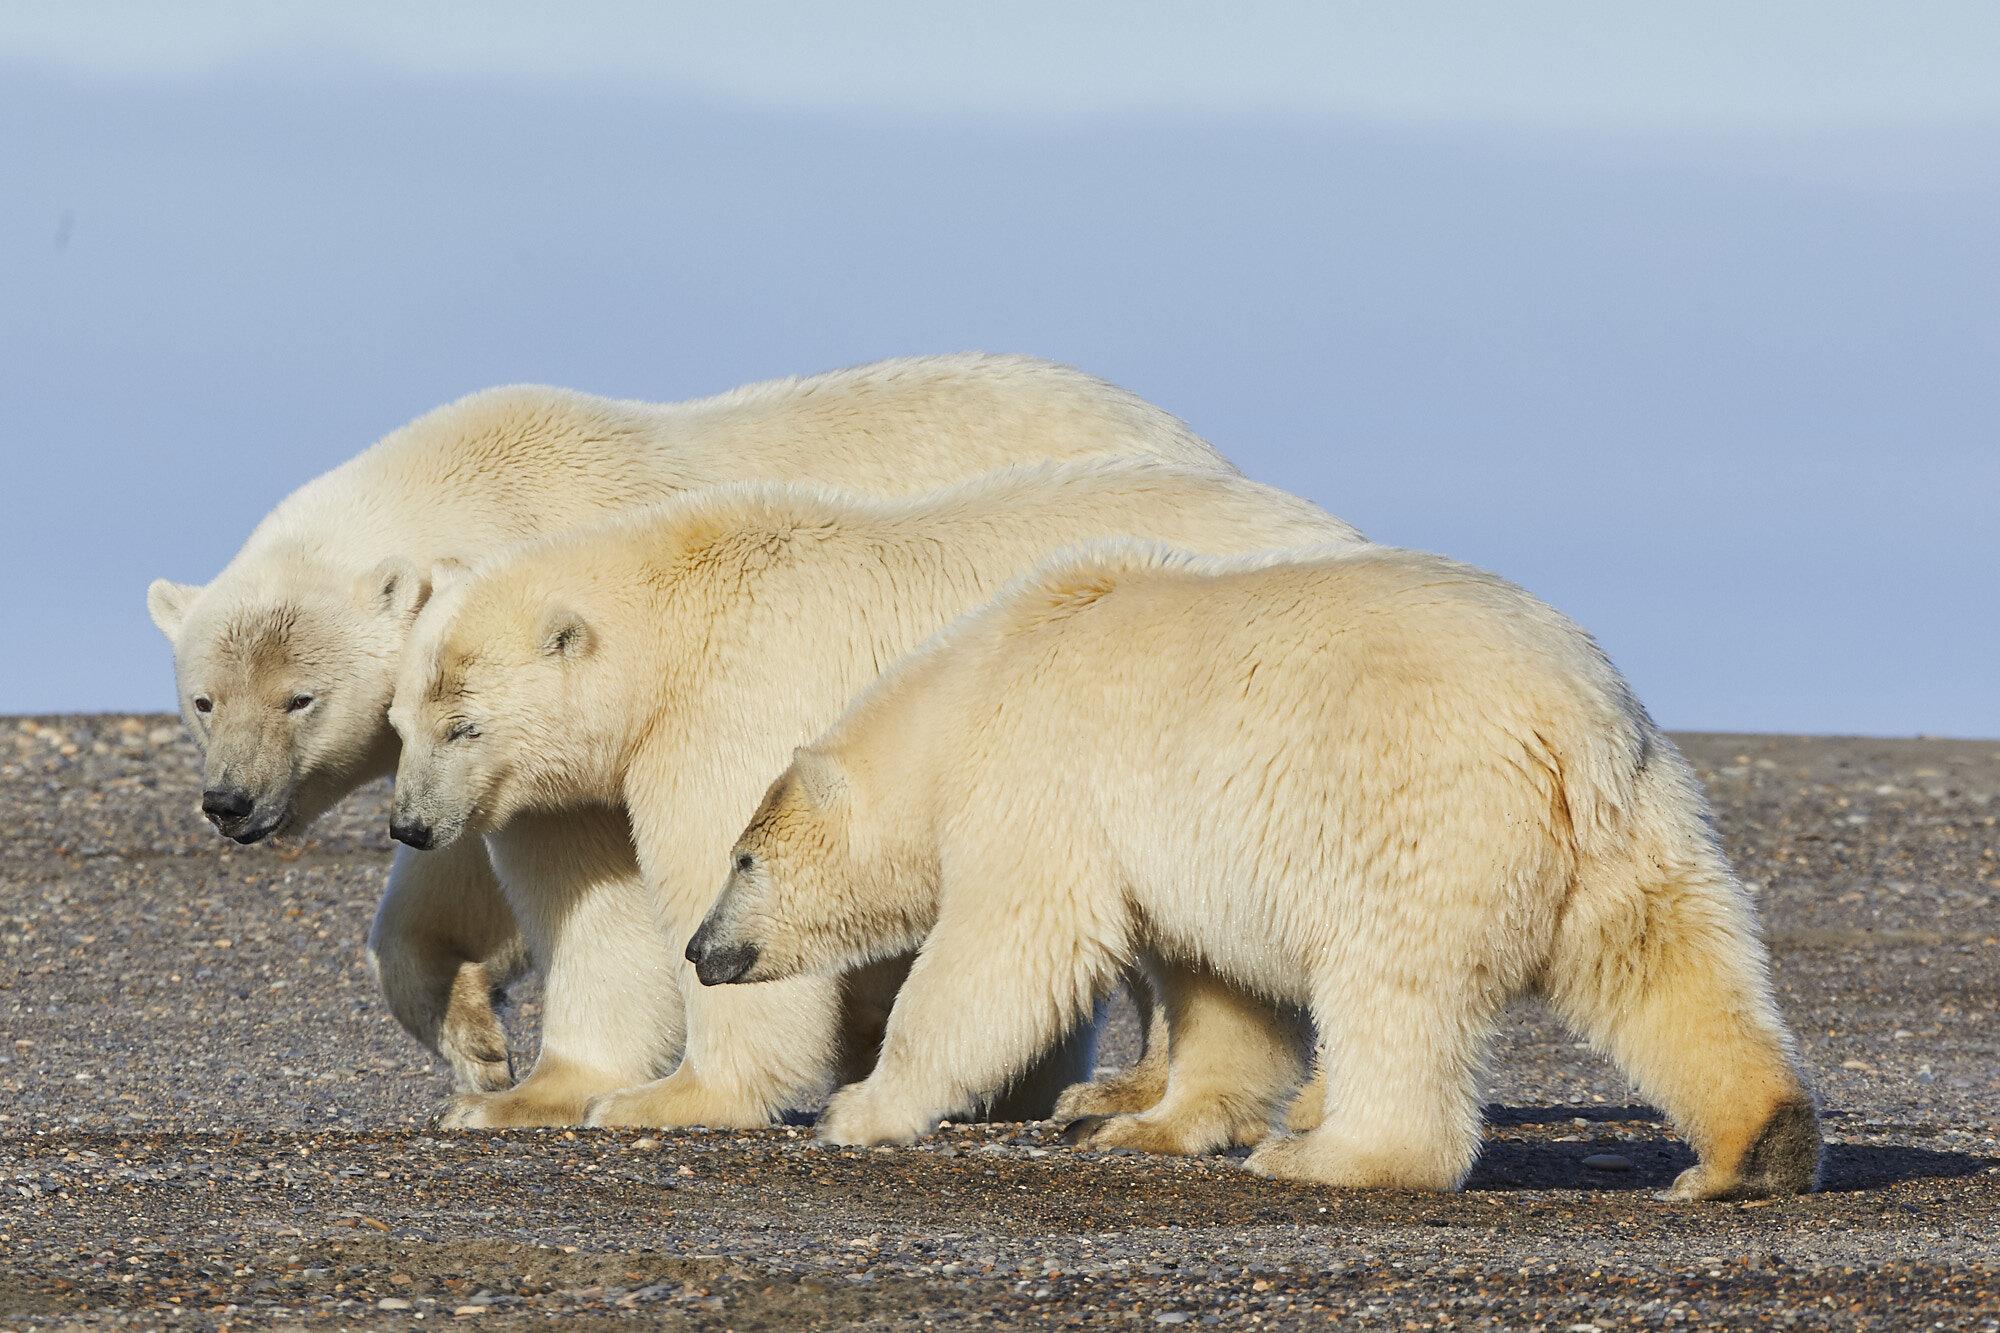 Alaska_Sept_2019_Polar Bears_118 1.jpg